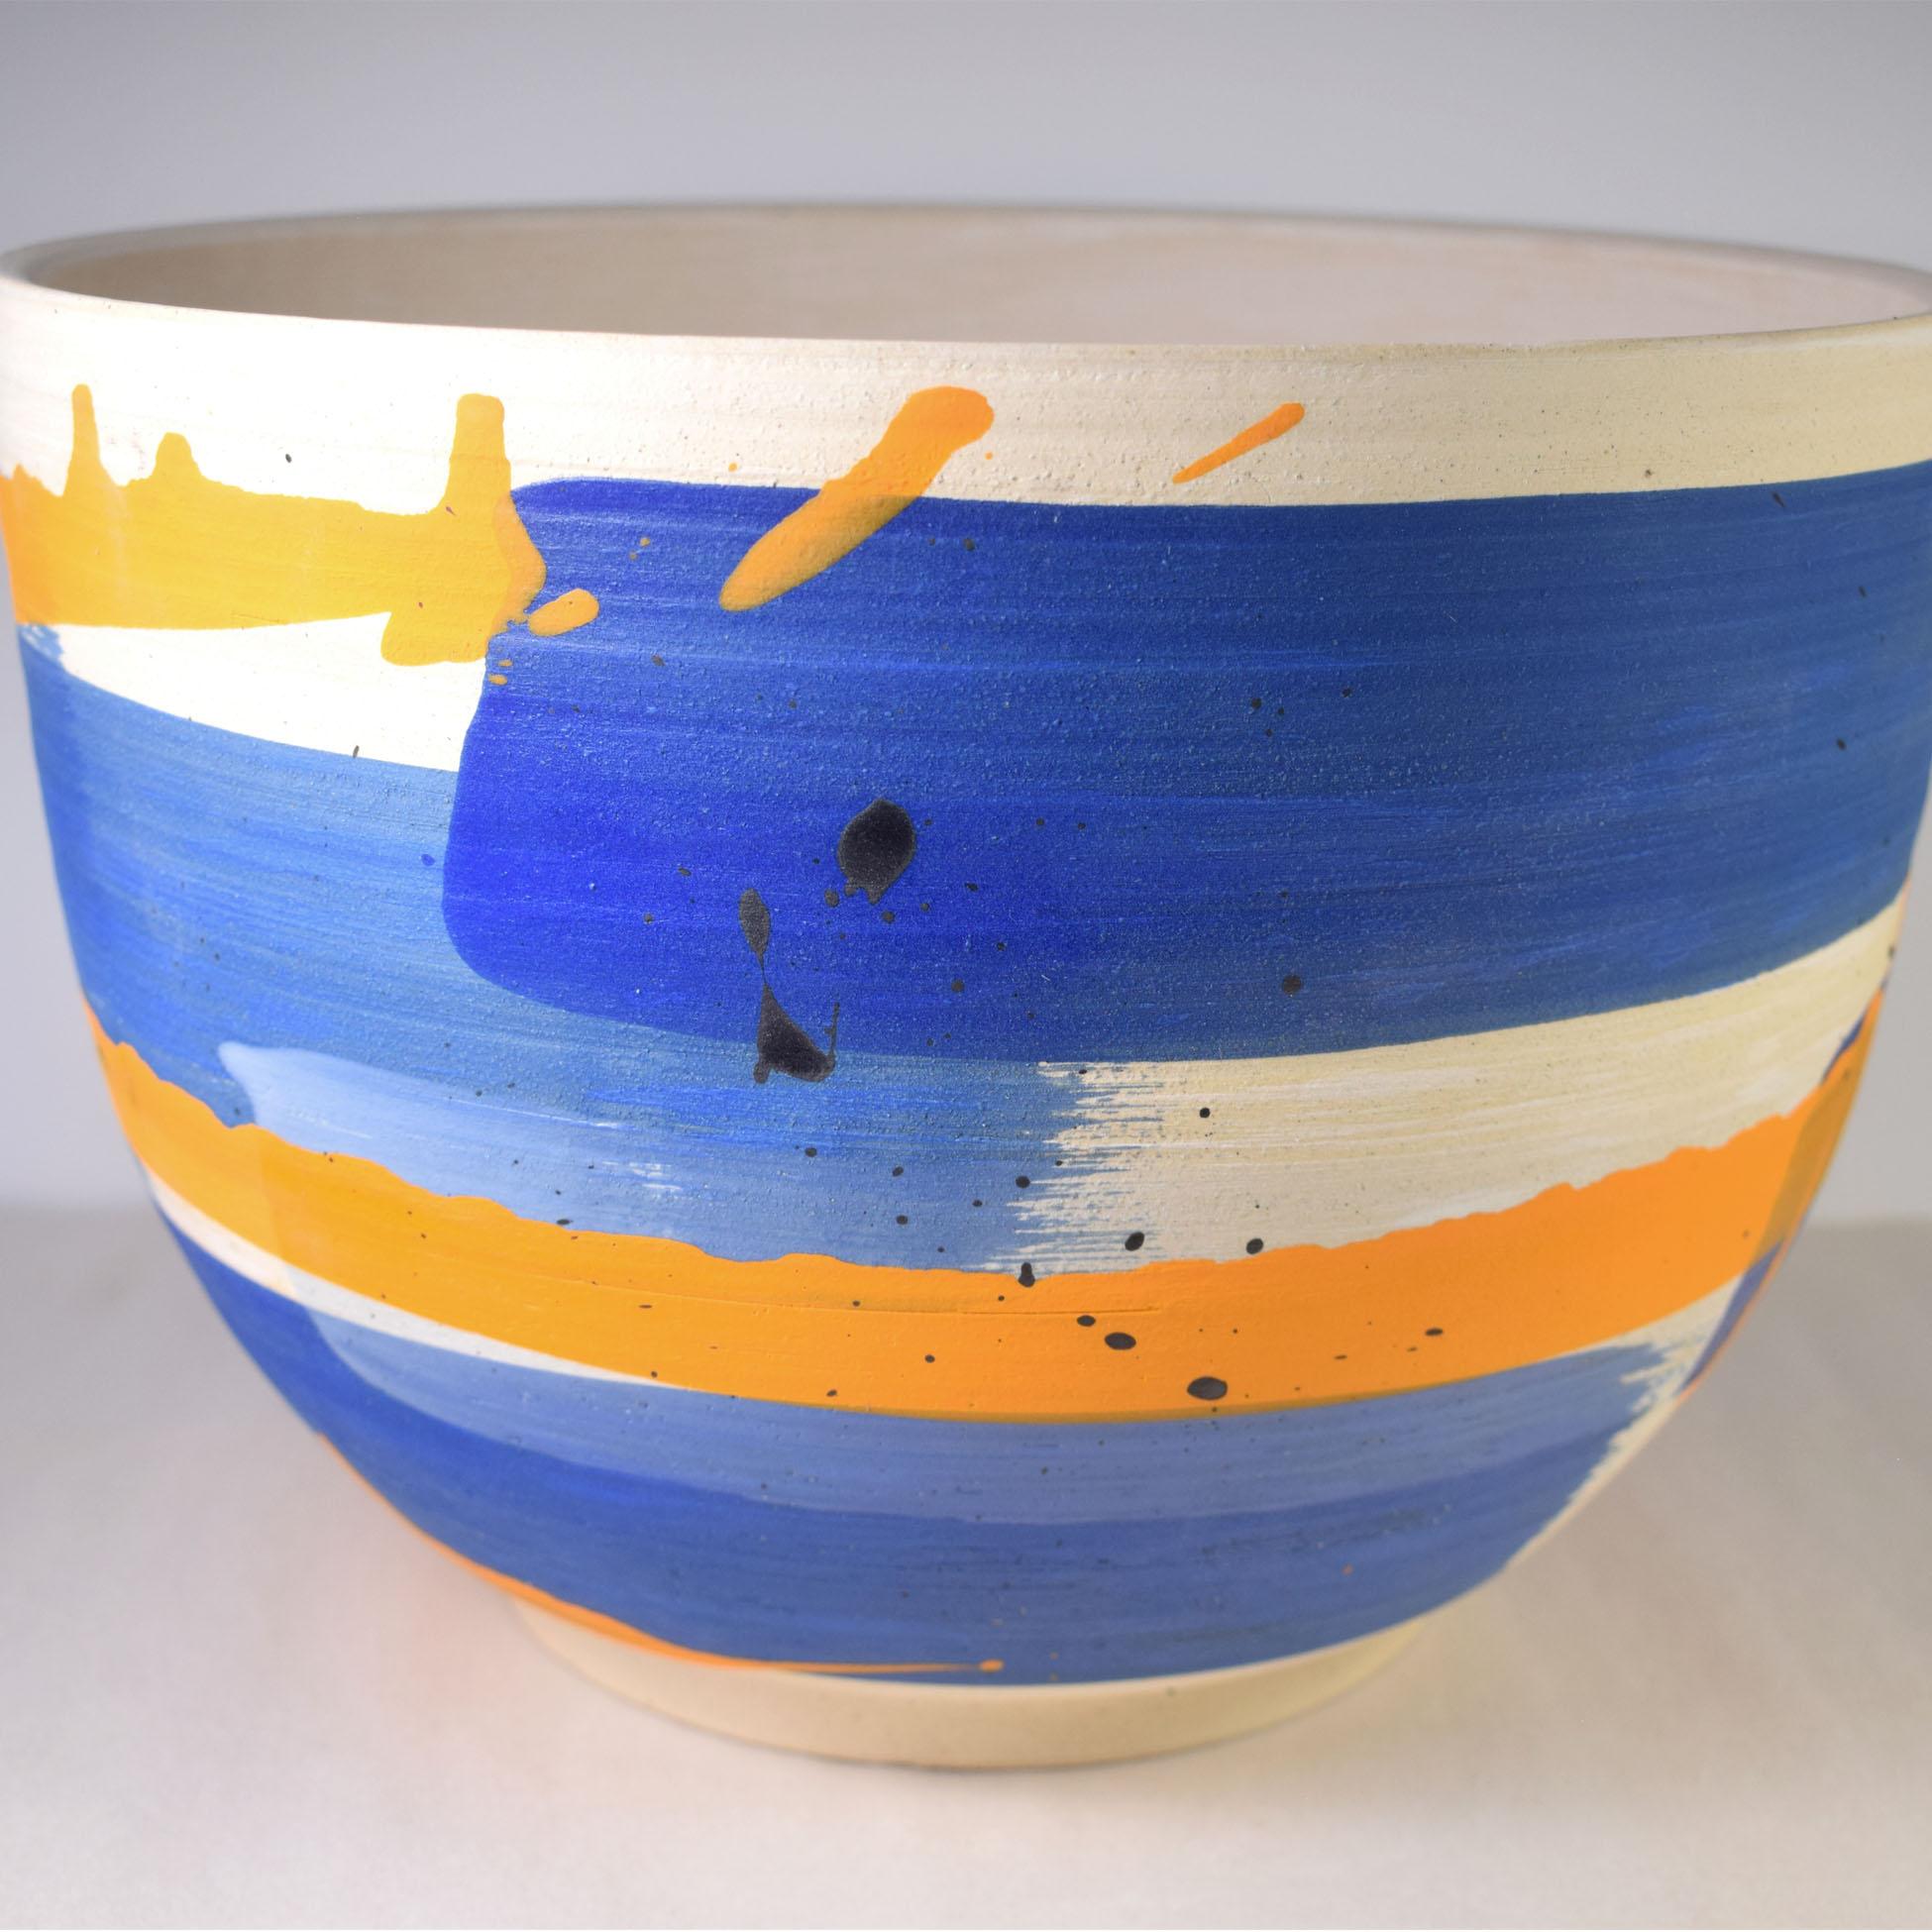 Large ceramic planter with blue, orange and black brush work